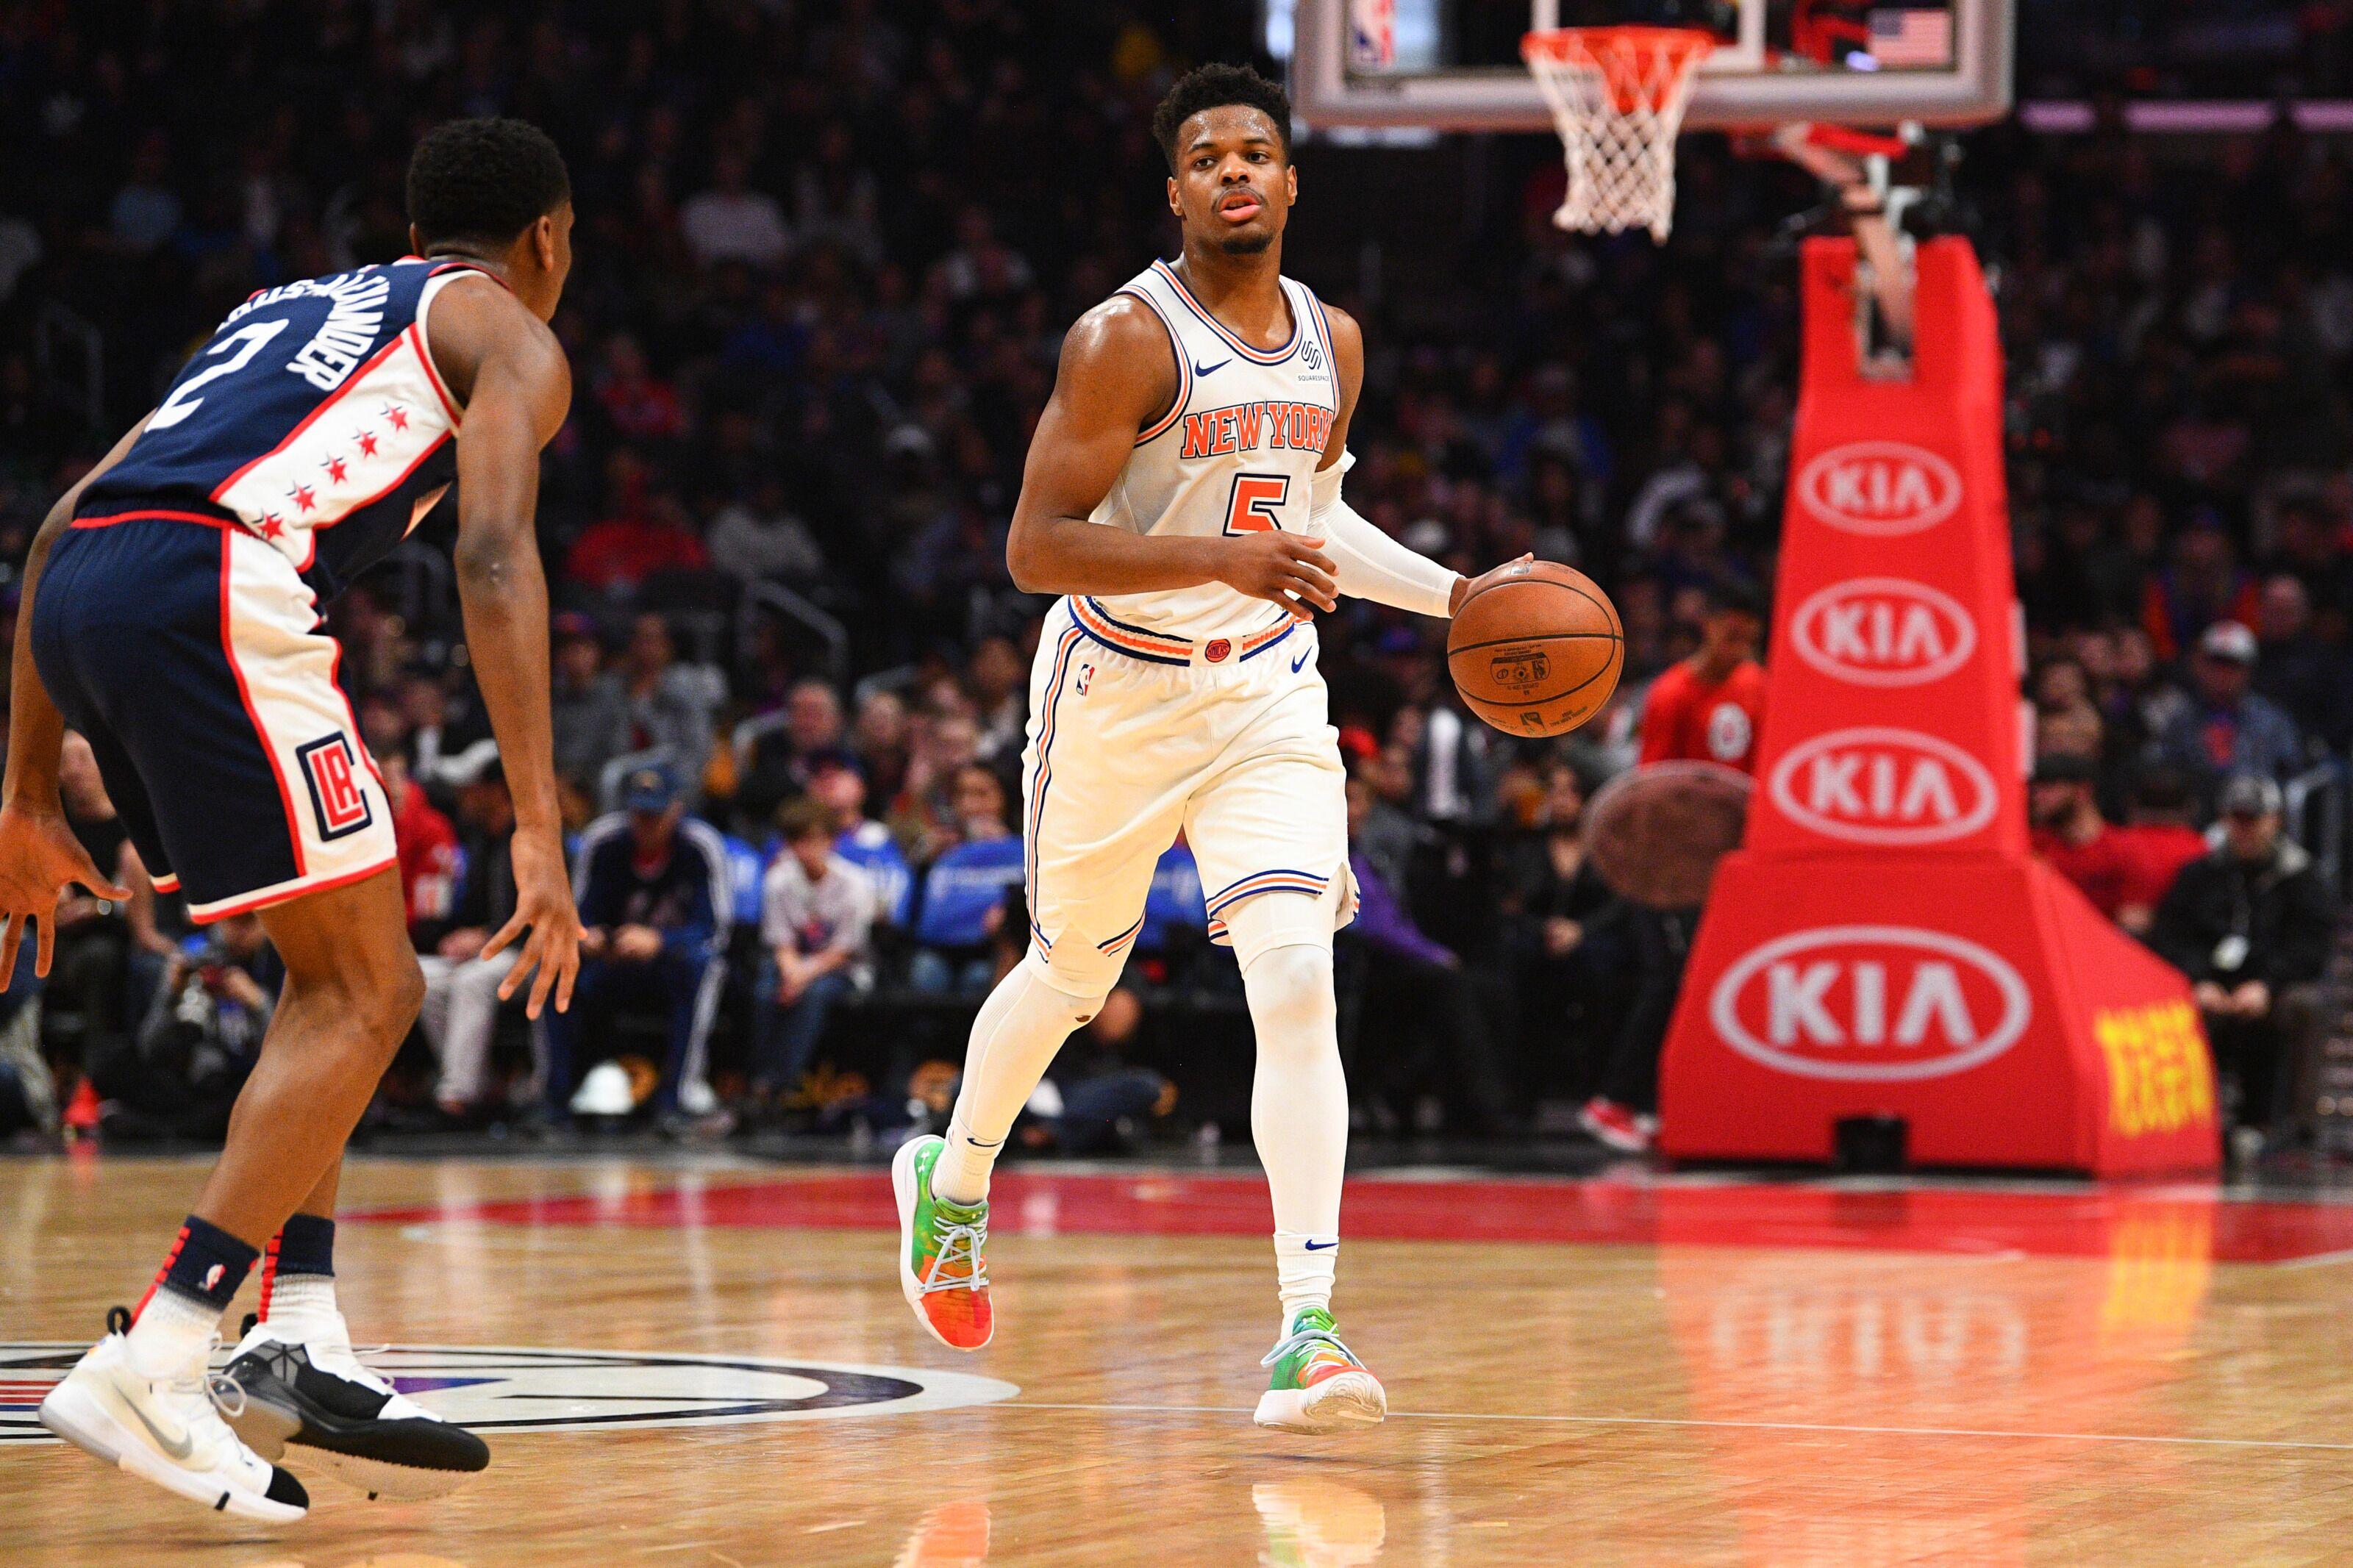 New York Knicks: Five ways to define a 'successful' season in 2019-20